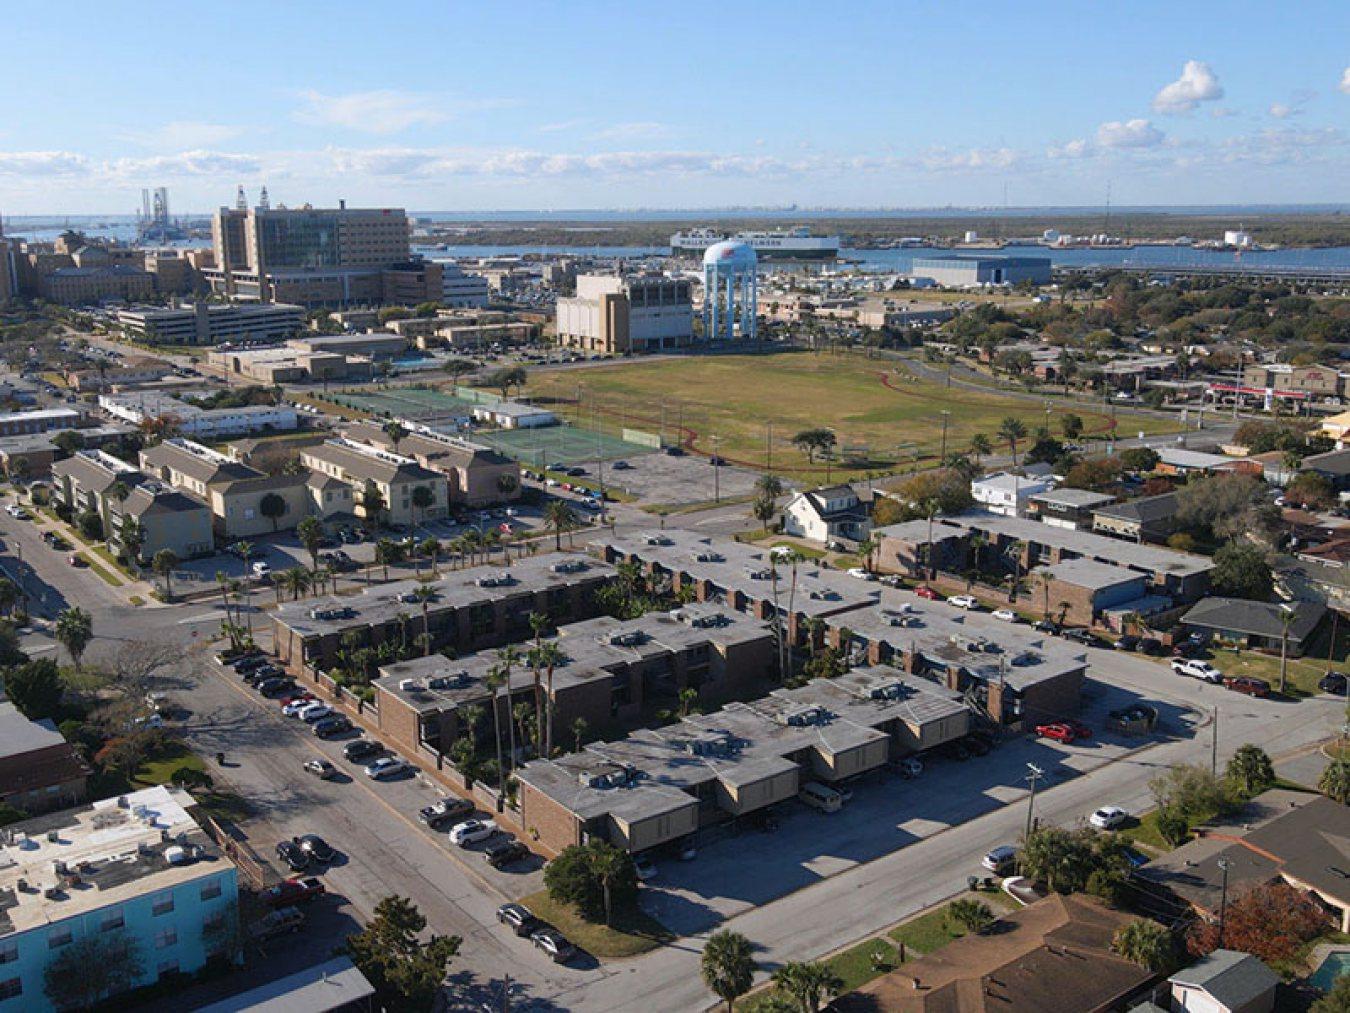 Ebbtide Apartments Aerial View